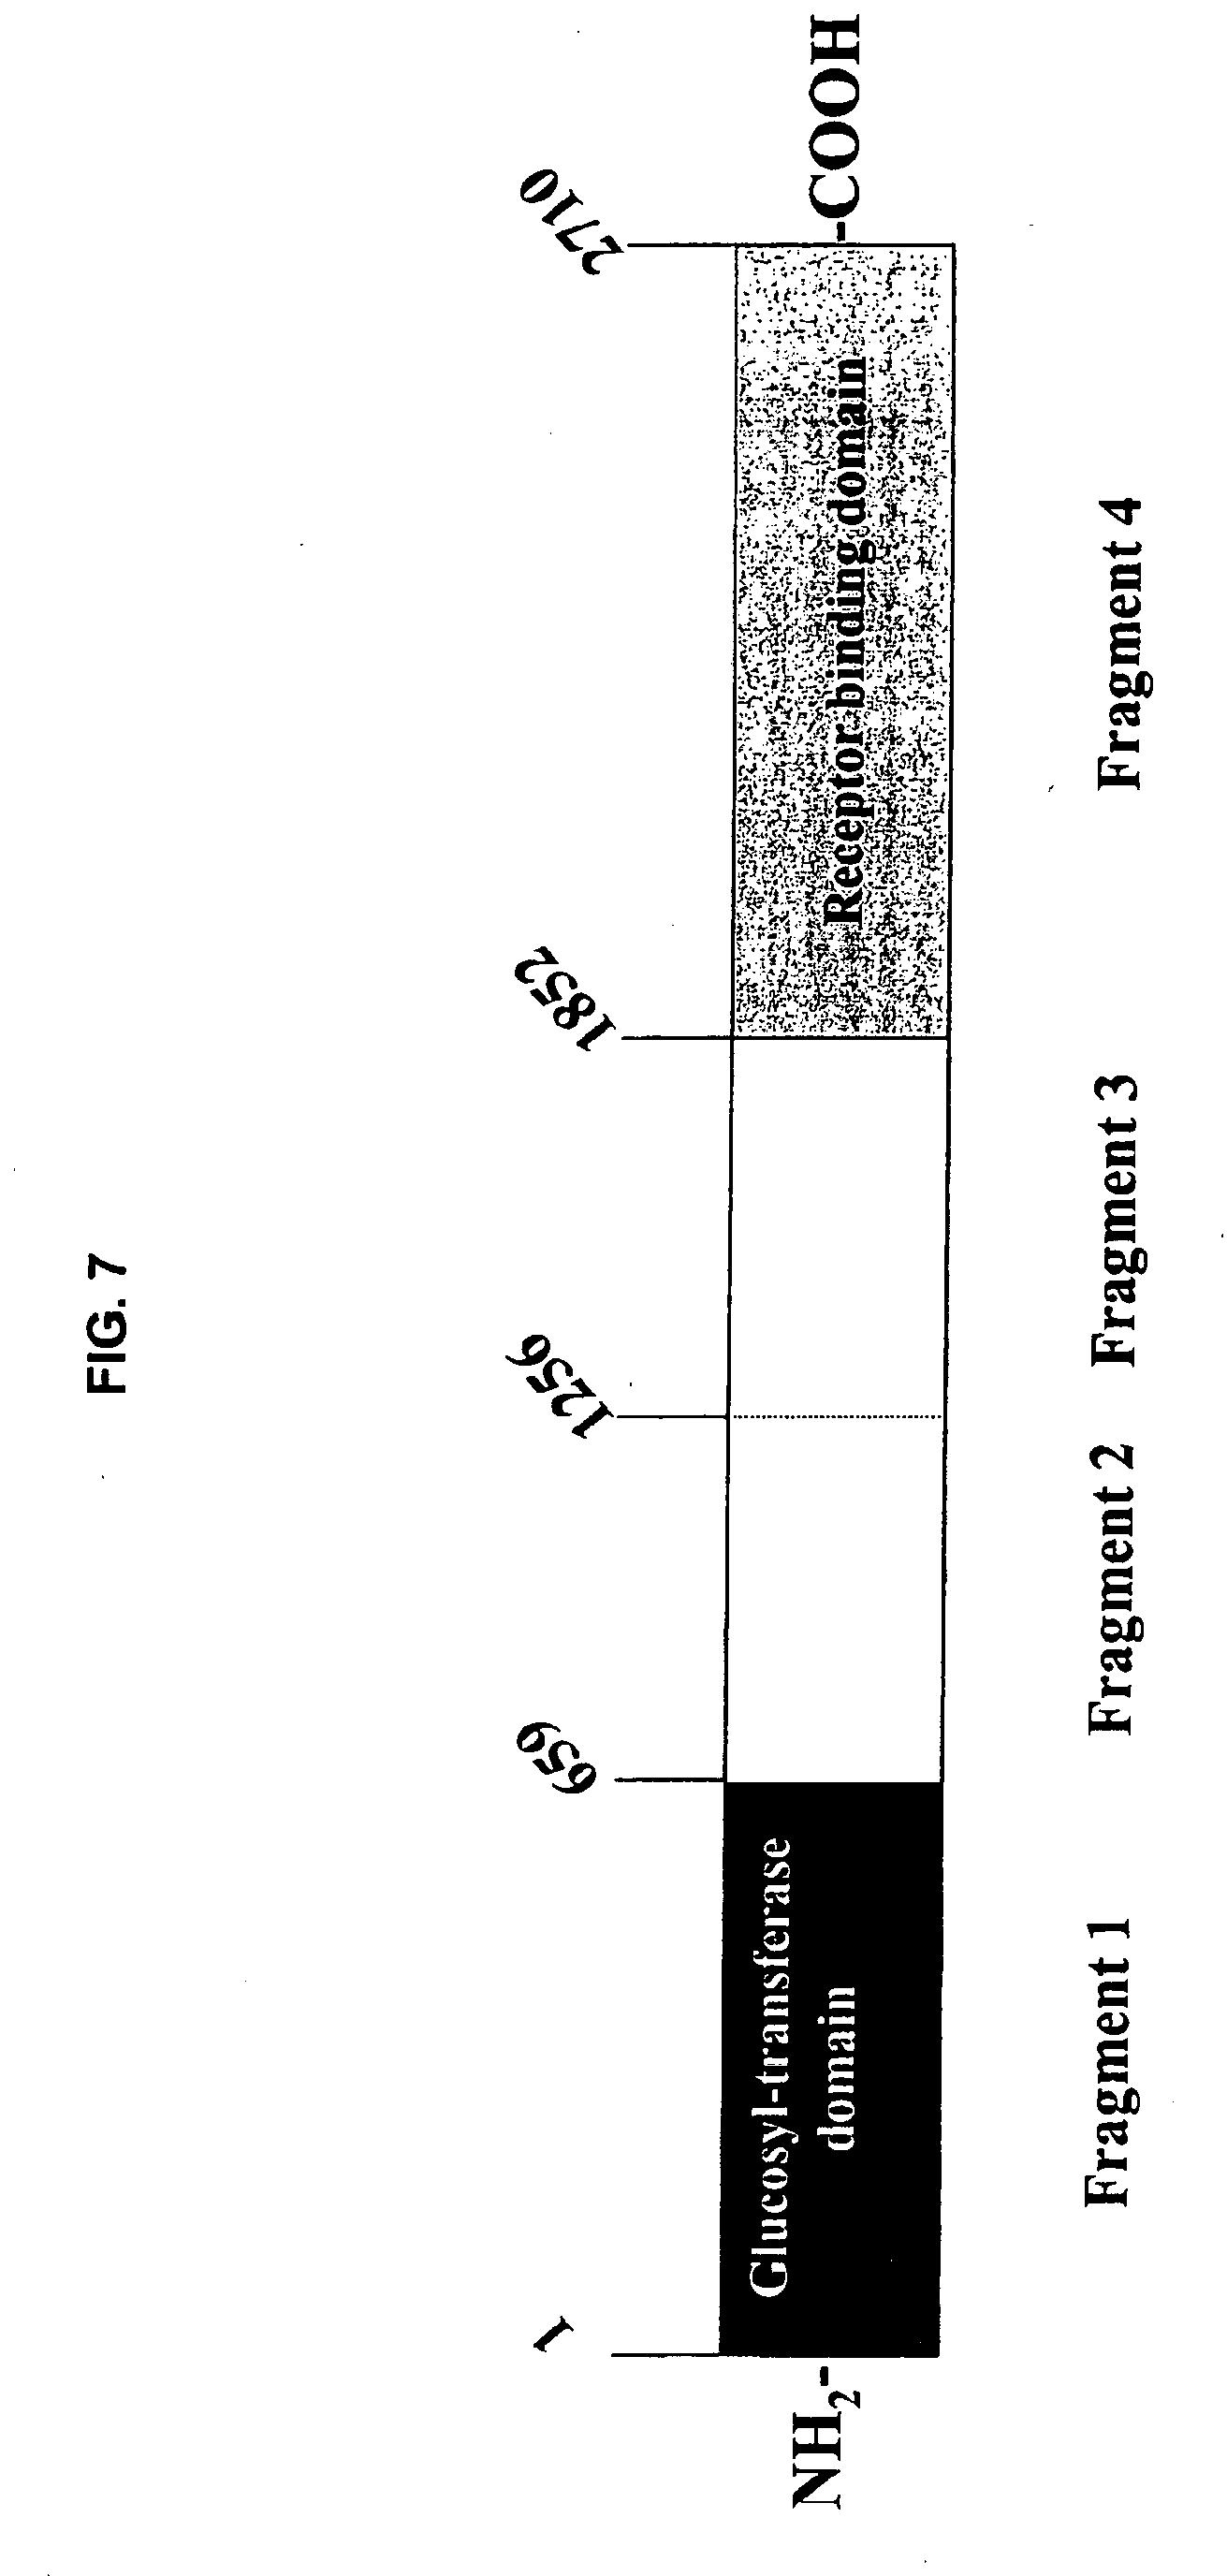 papilloma krém proizvodjac baba dermatitis